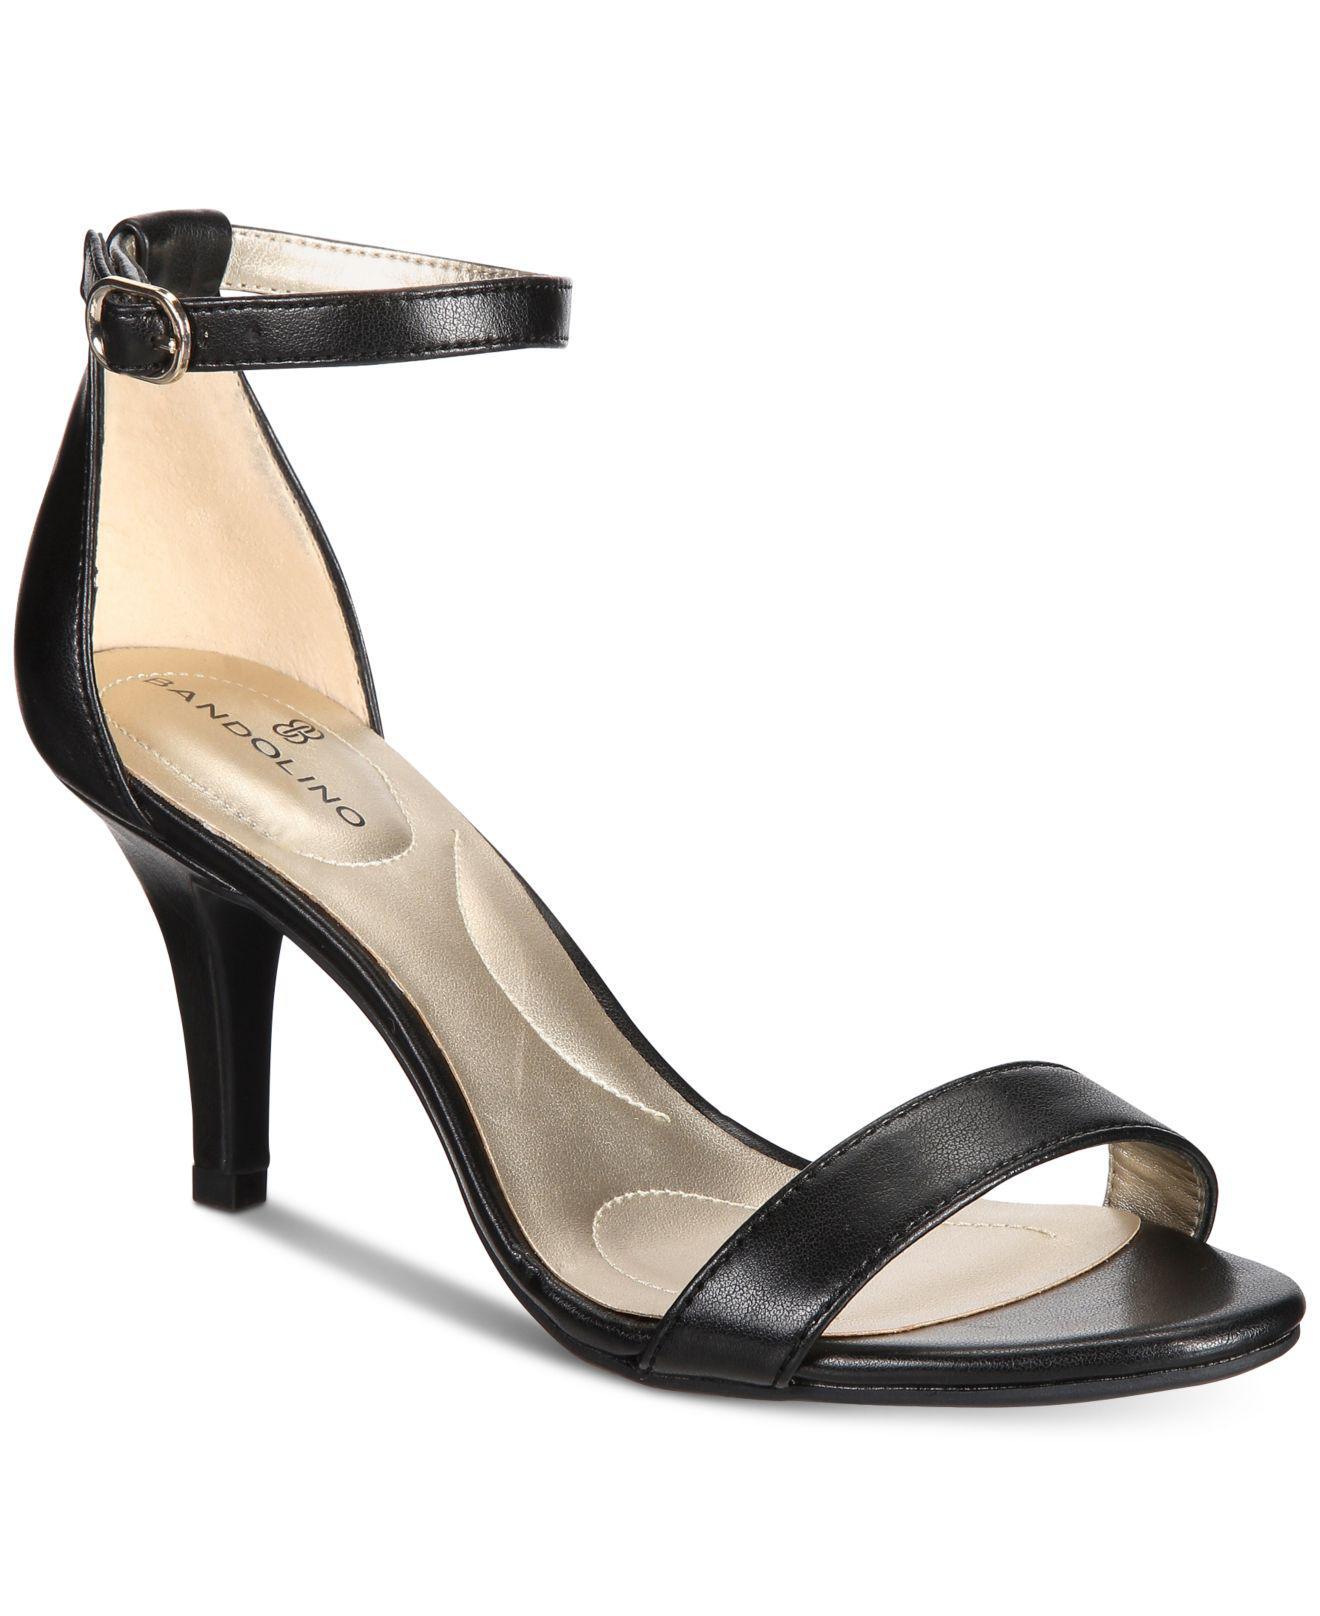 850b4548122dbc Lyst - Bandolino Madia Sandals in Black